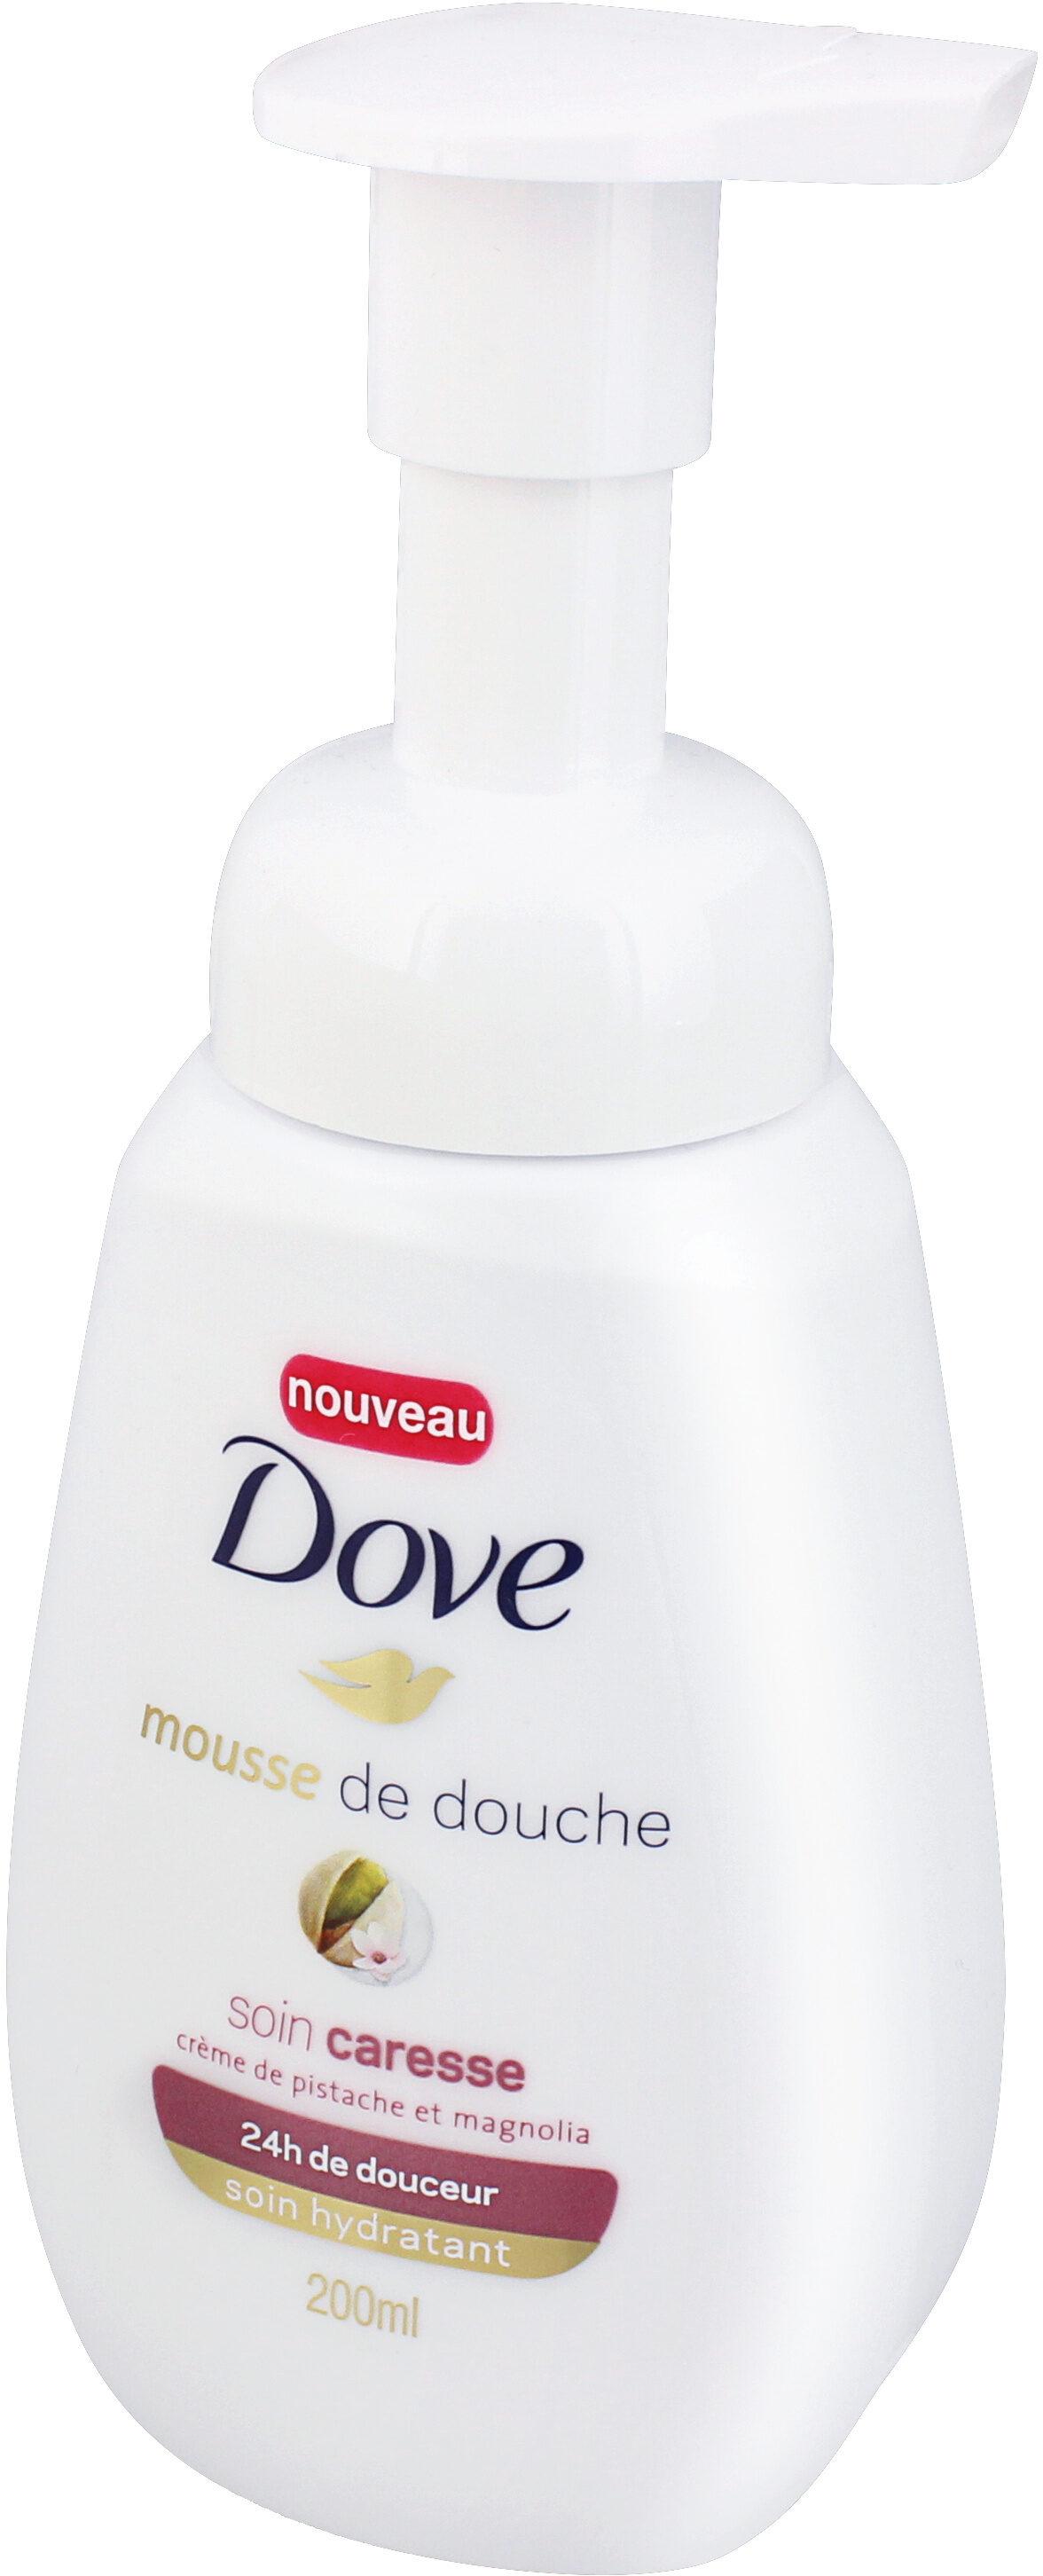 Dove Gel Douche Mousse Soin Caresse - Product - fr